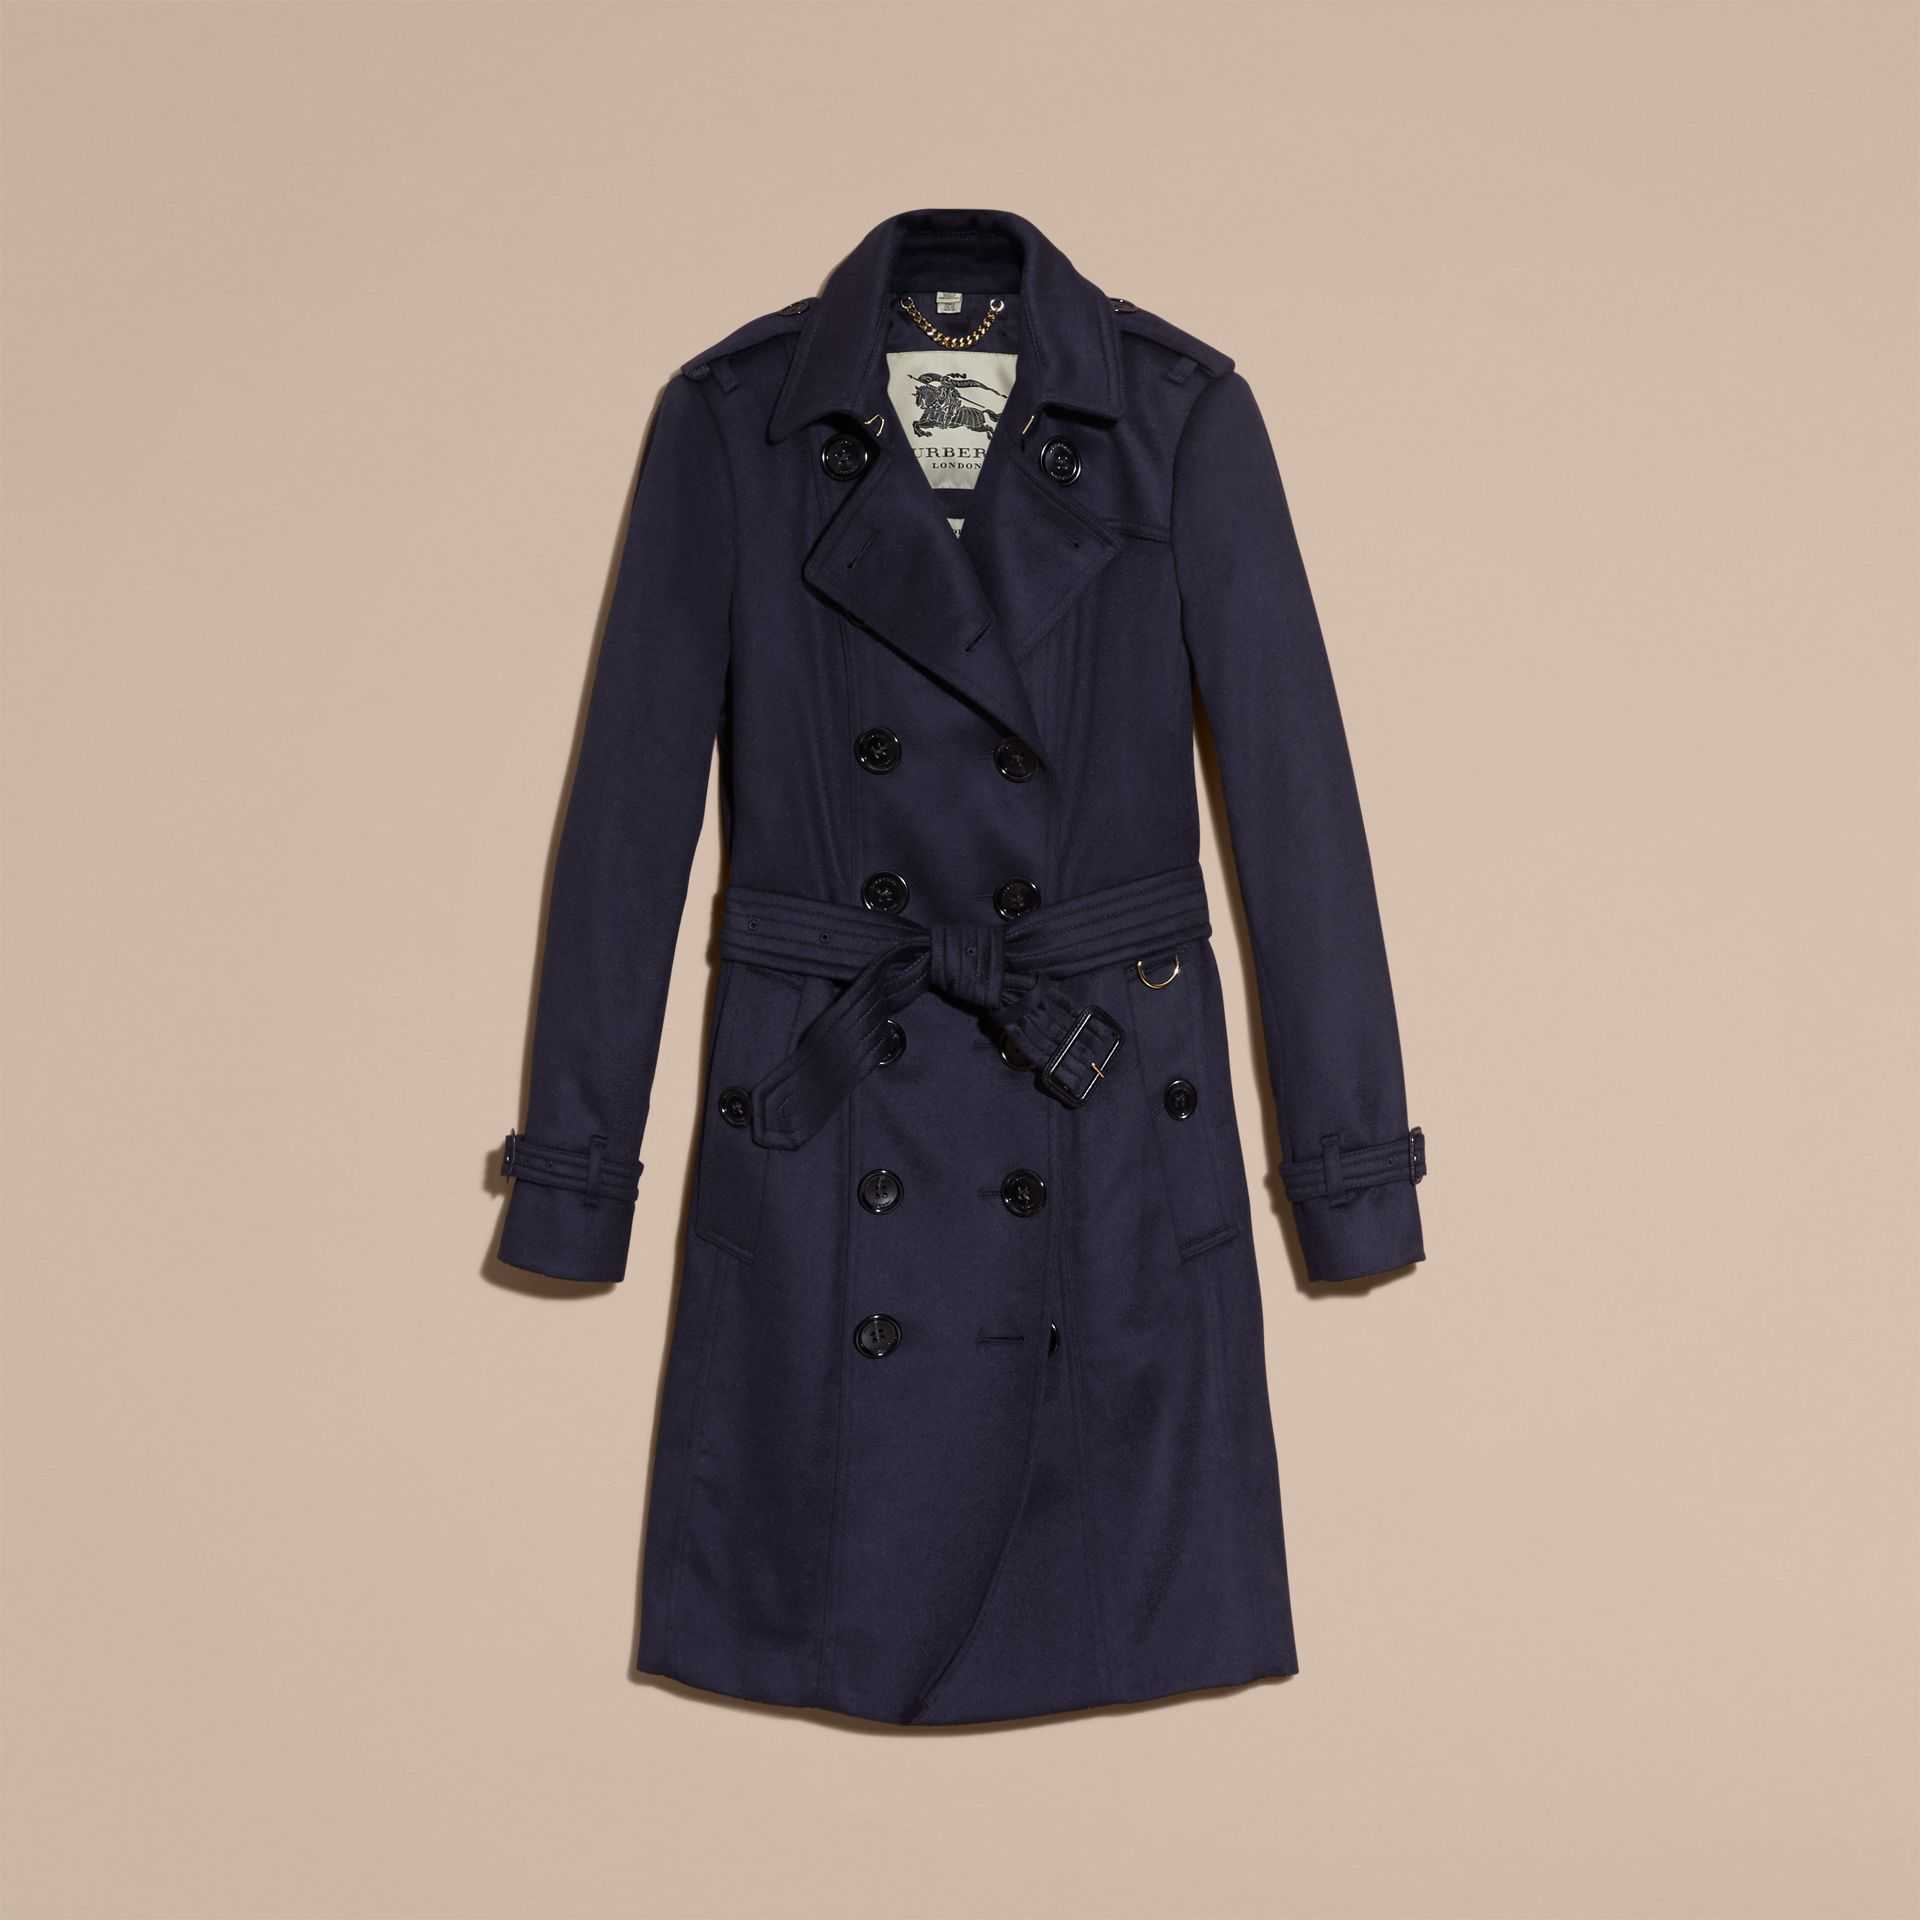 Indigo Sandringham Fit Cashmere Trench Coat Indigo - gallery image 4